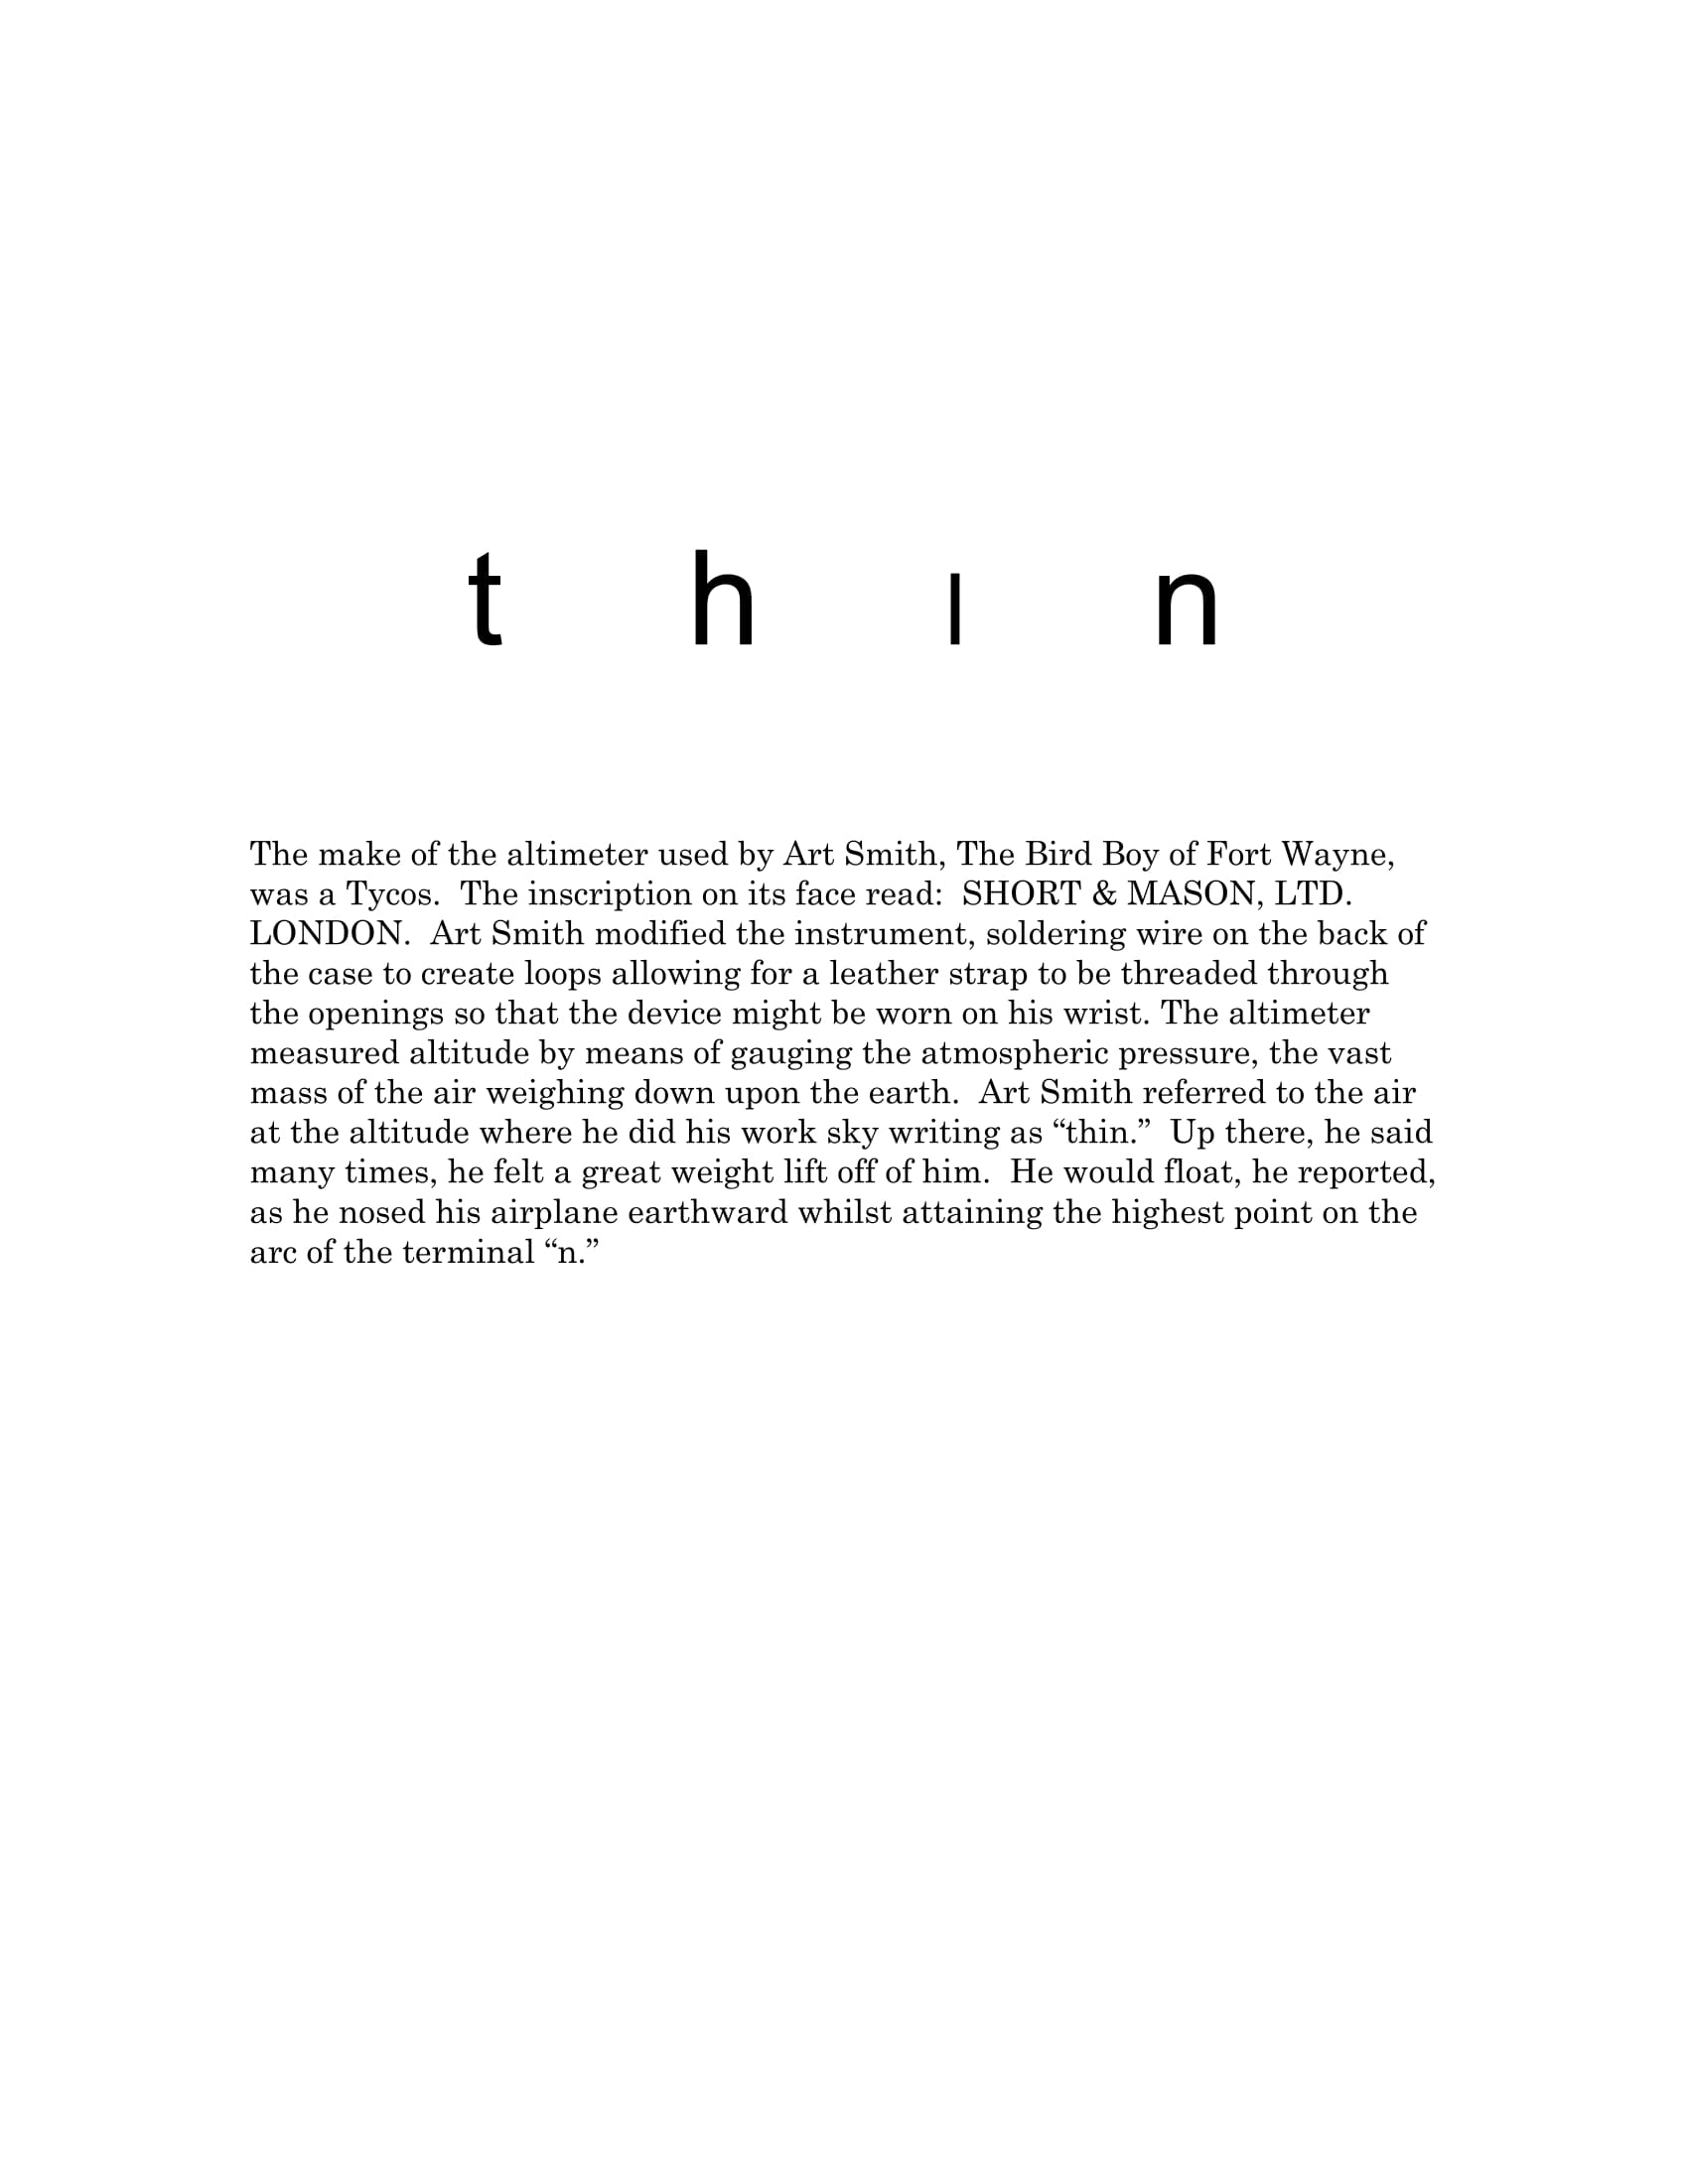 thin1-1.jpg